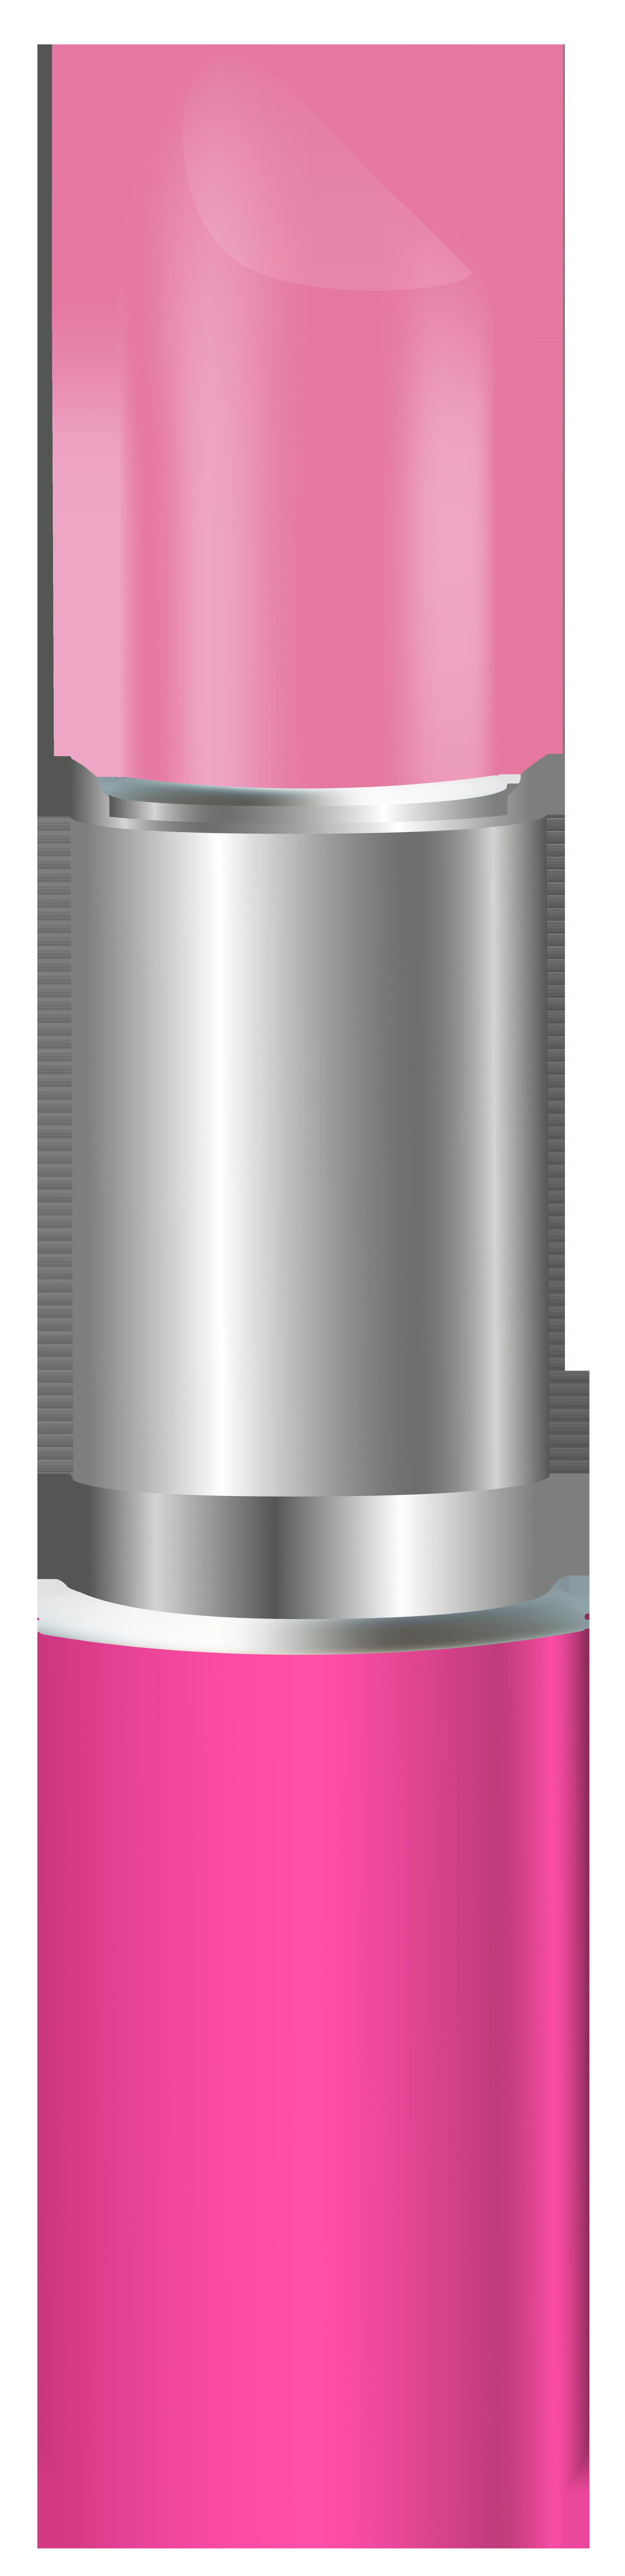 Lipstick Transparent PNG Clip Art Image